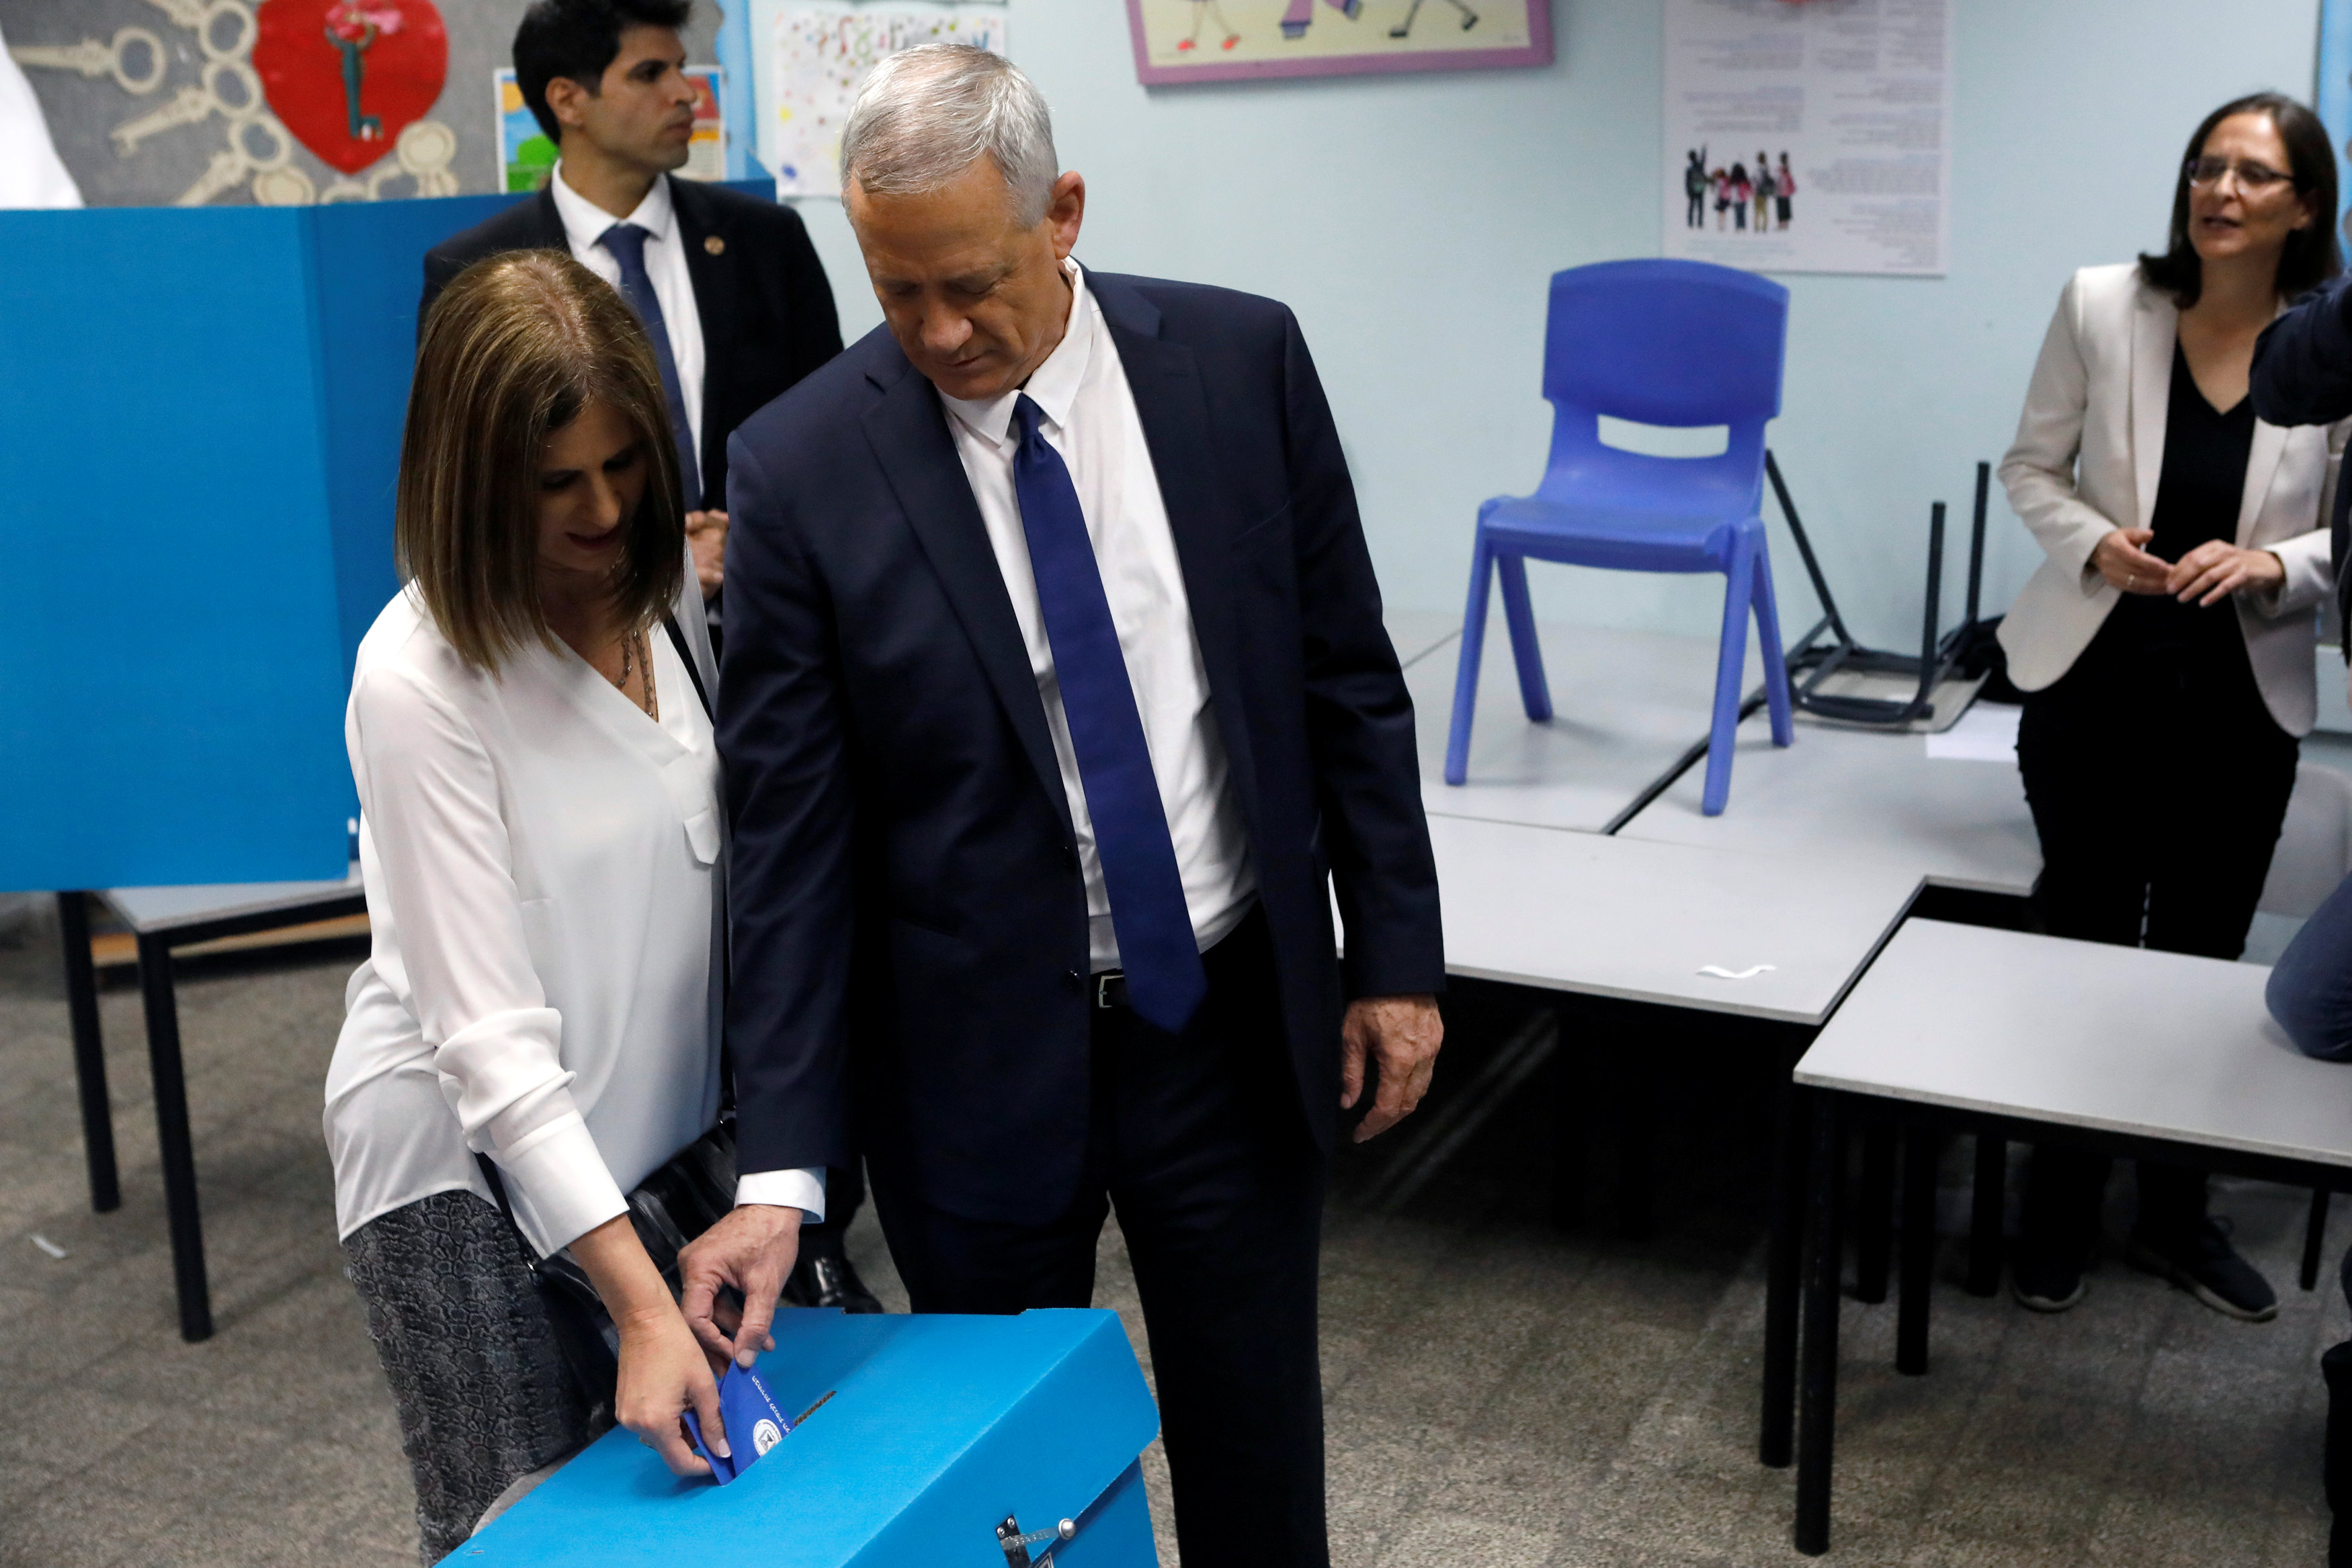 2019-04-09t063809z_67310358_rc1c76367000_rtrmadp_3_israel-election-gantz-votes